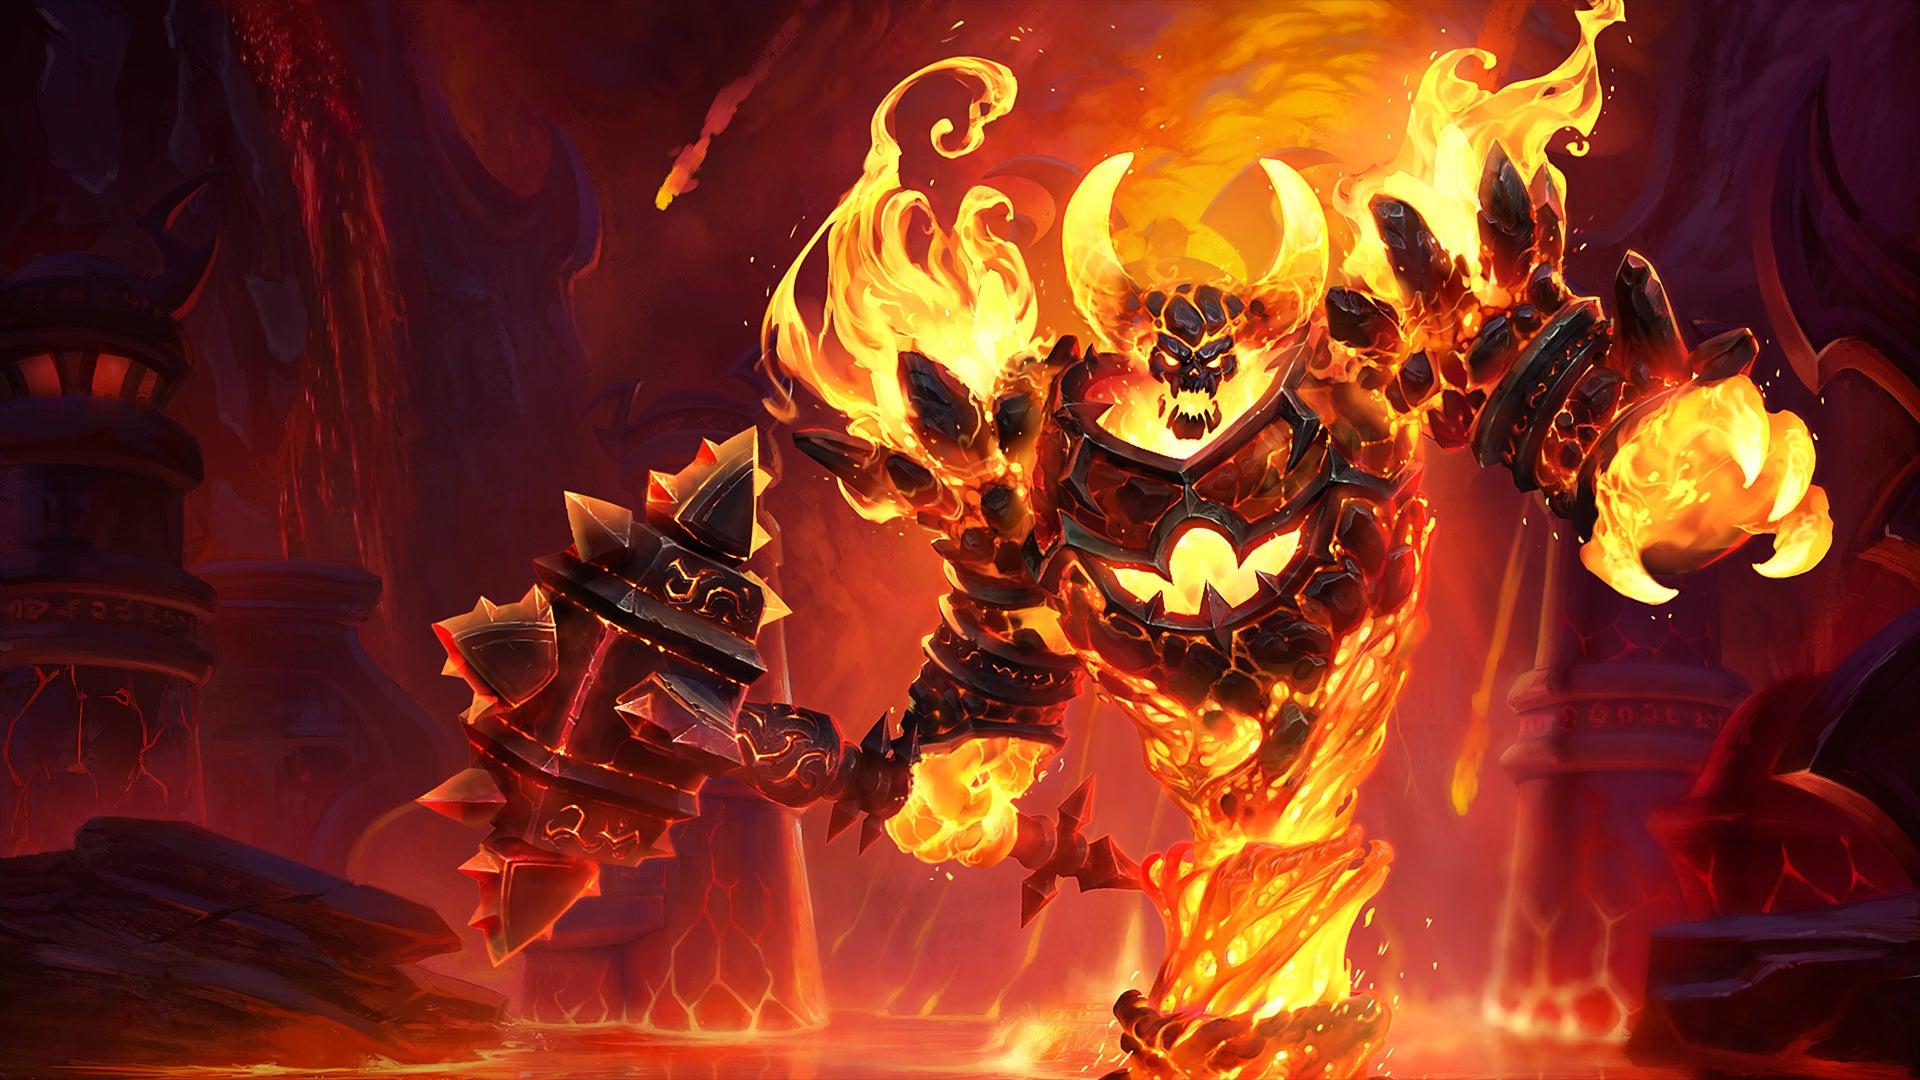 European Guild Blazes Through WoW Classic's First 2 Raids In 6 Days